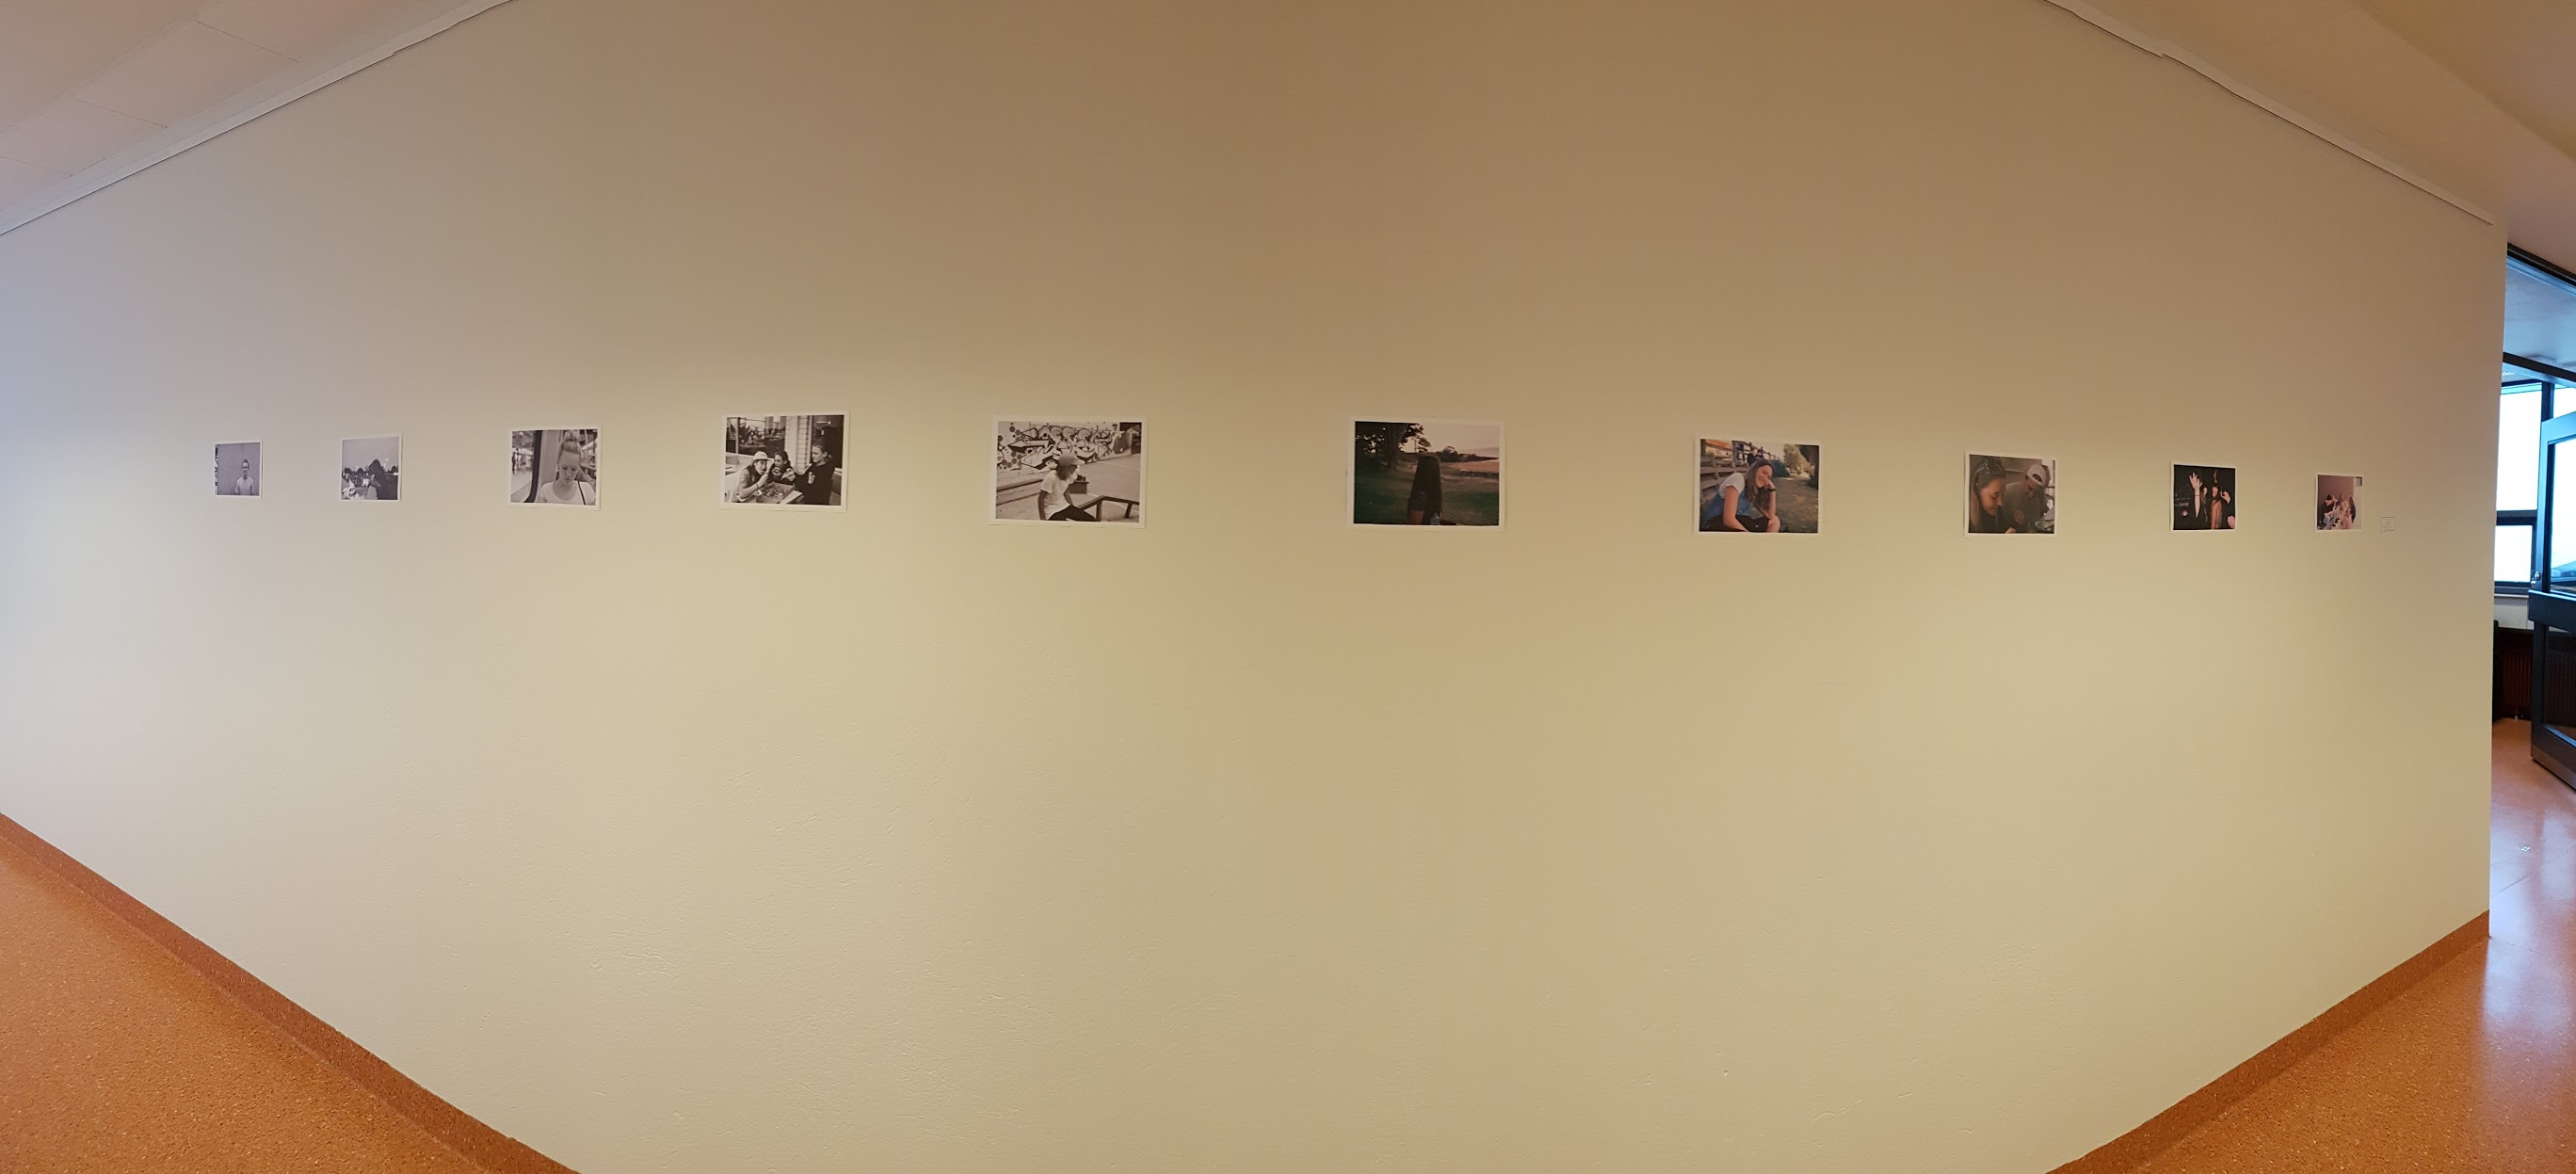 Skammdegi Exhibitions